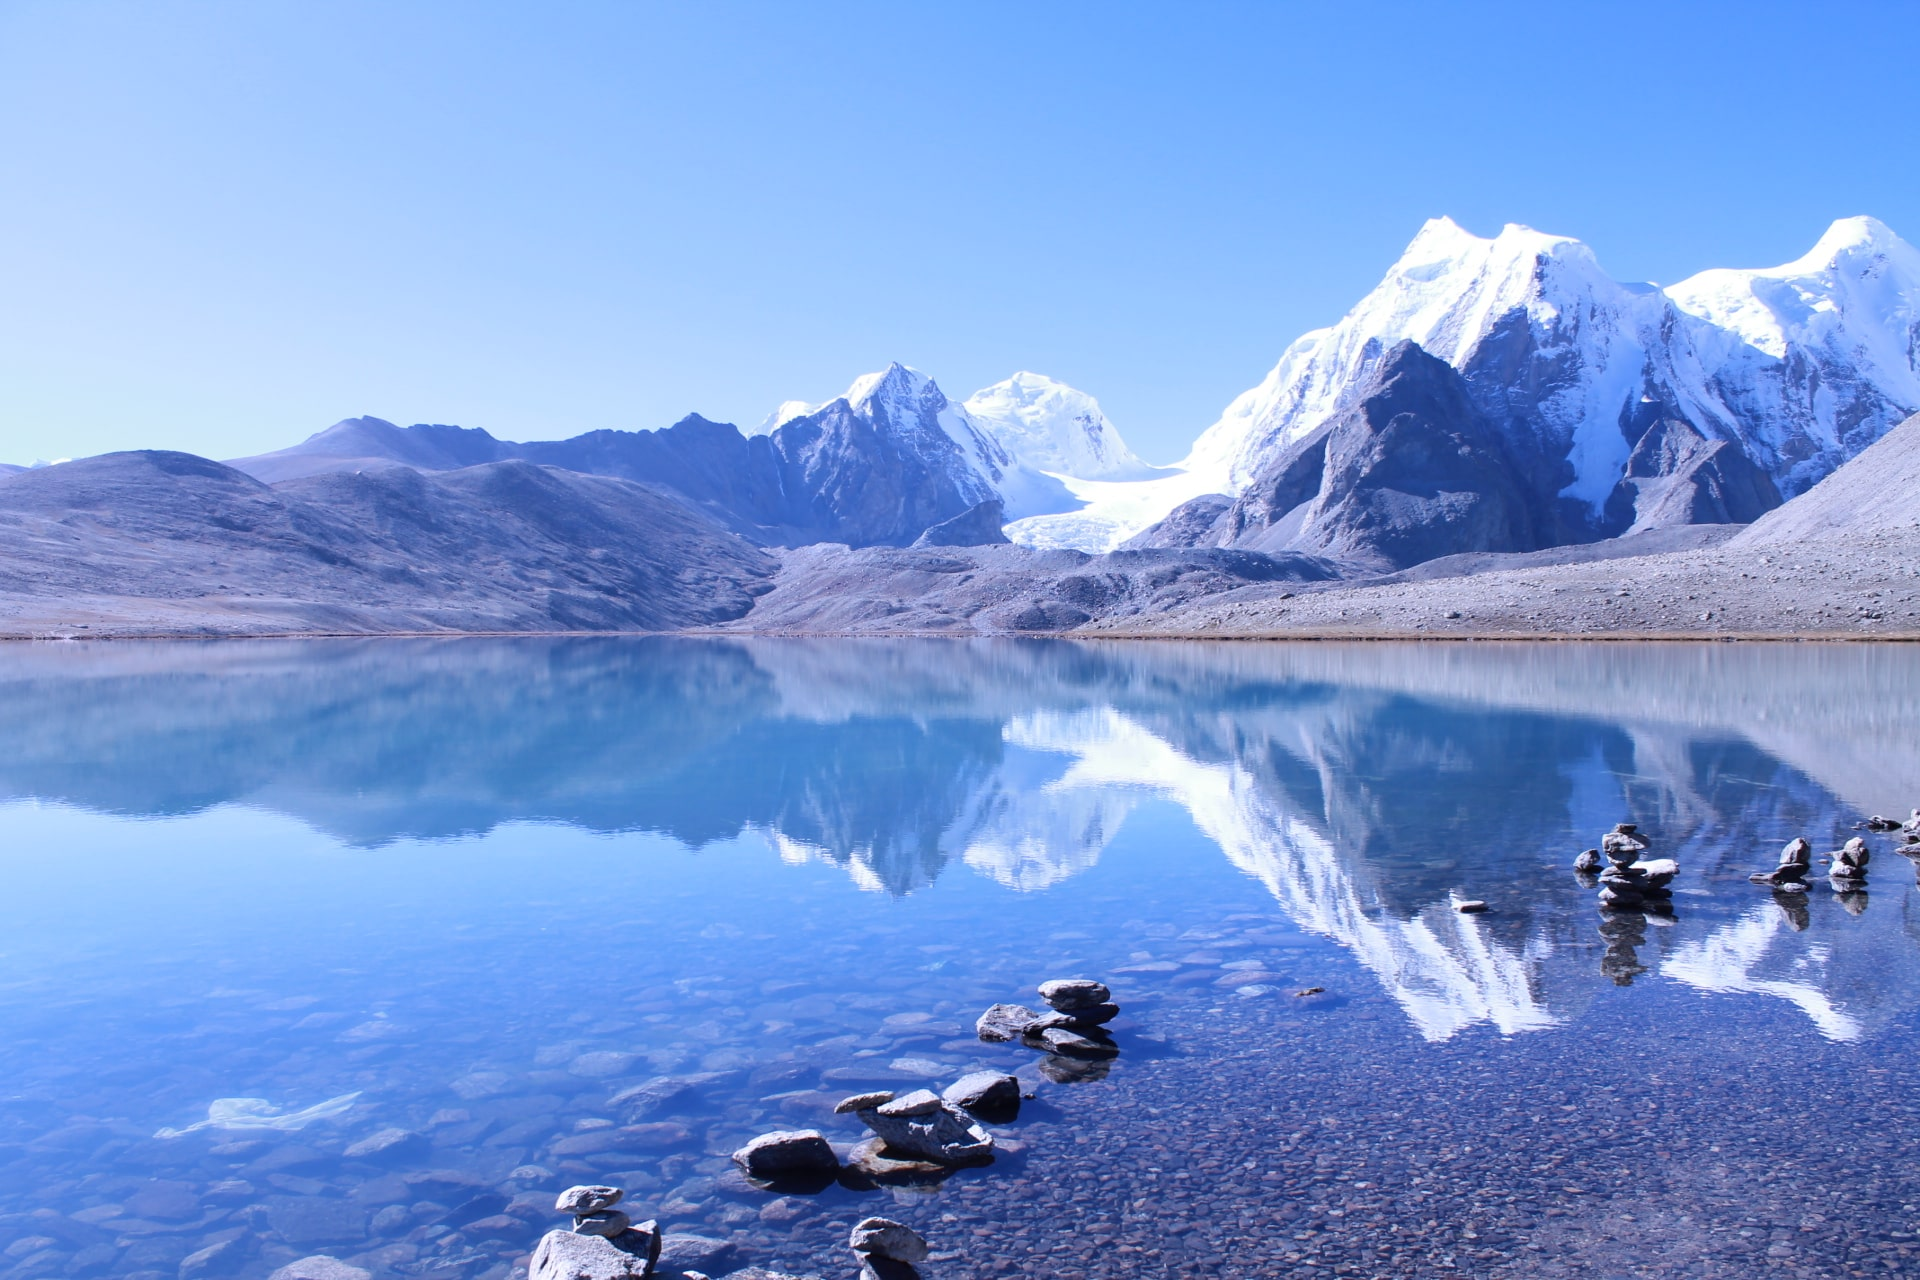 gurudongmar-lake-one-of-the-highest-lake-secret-world